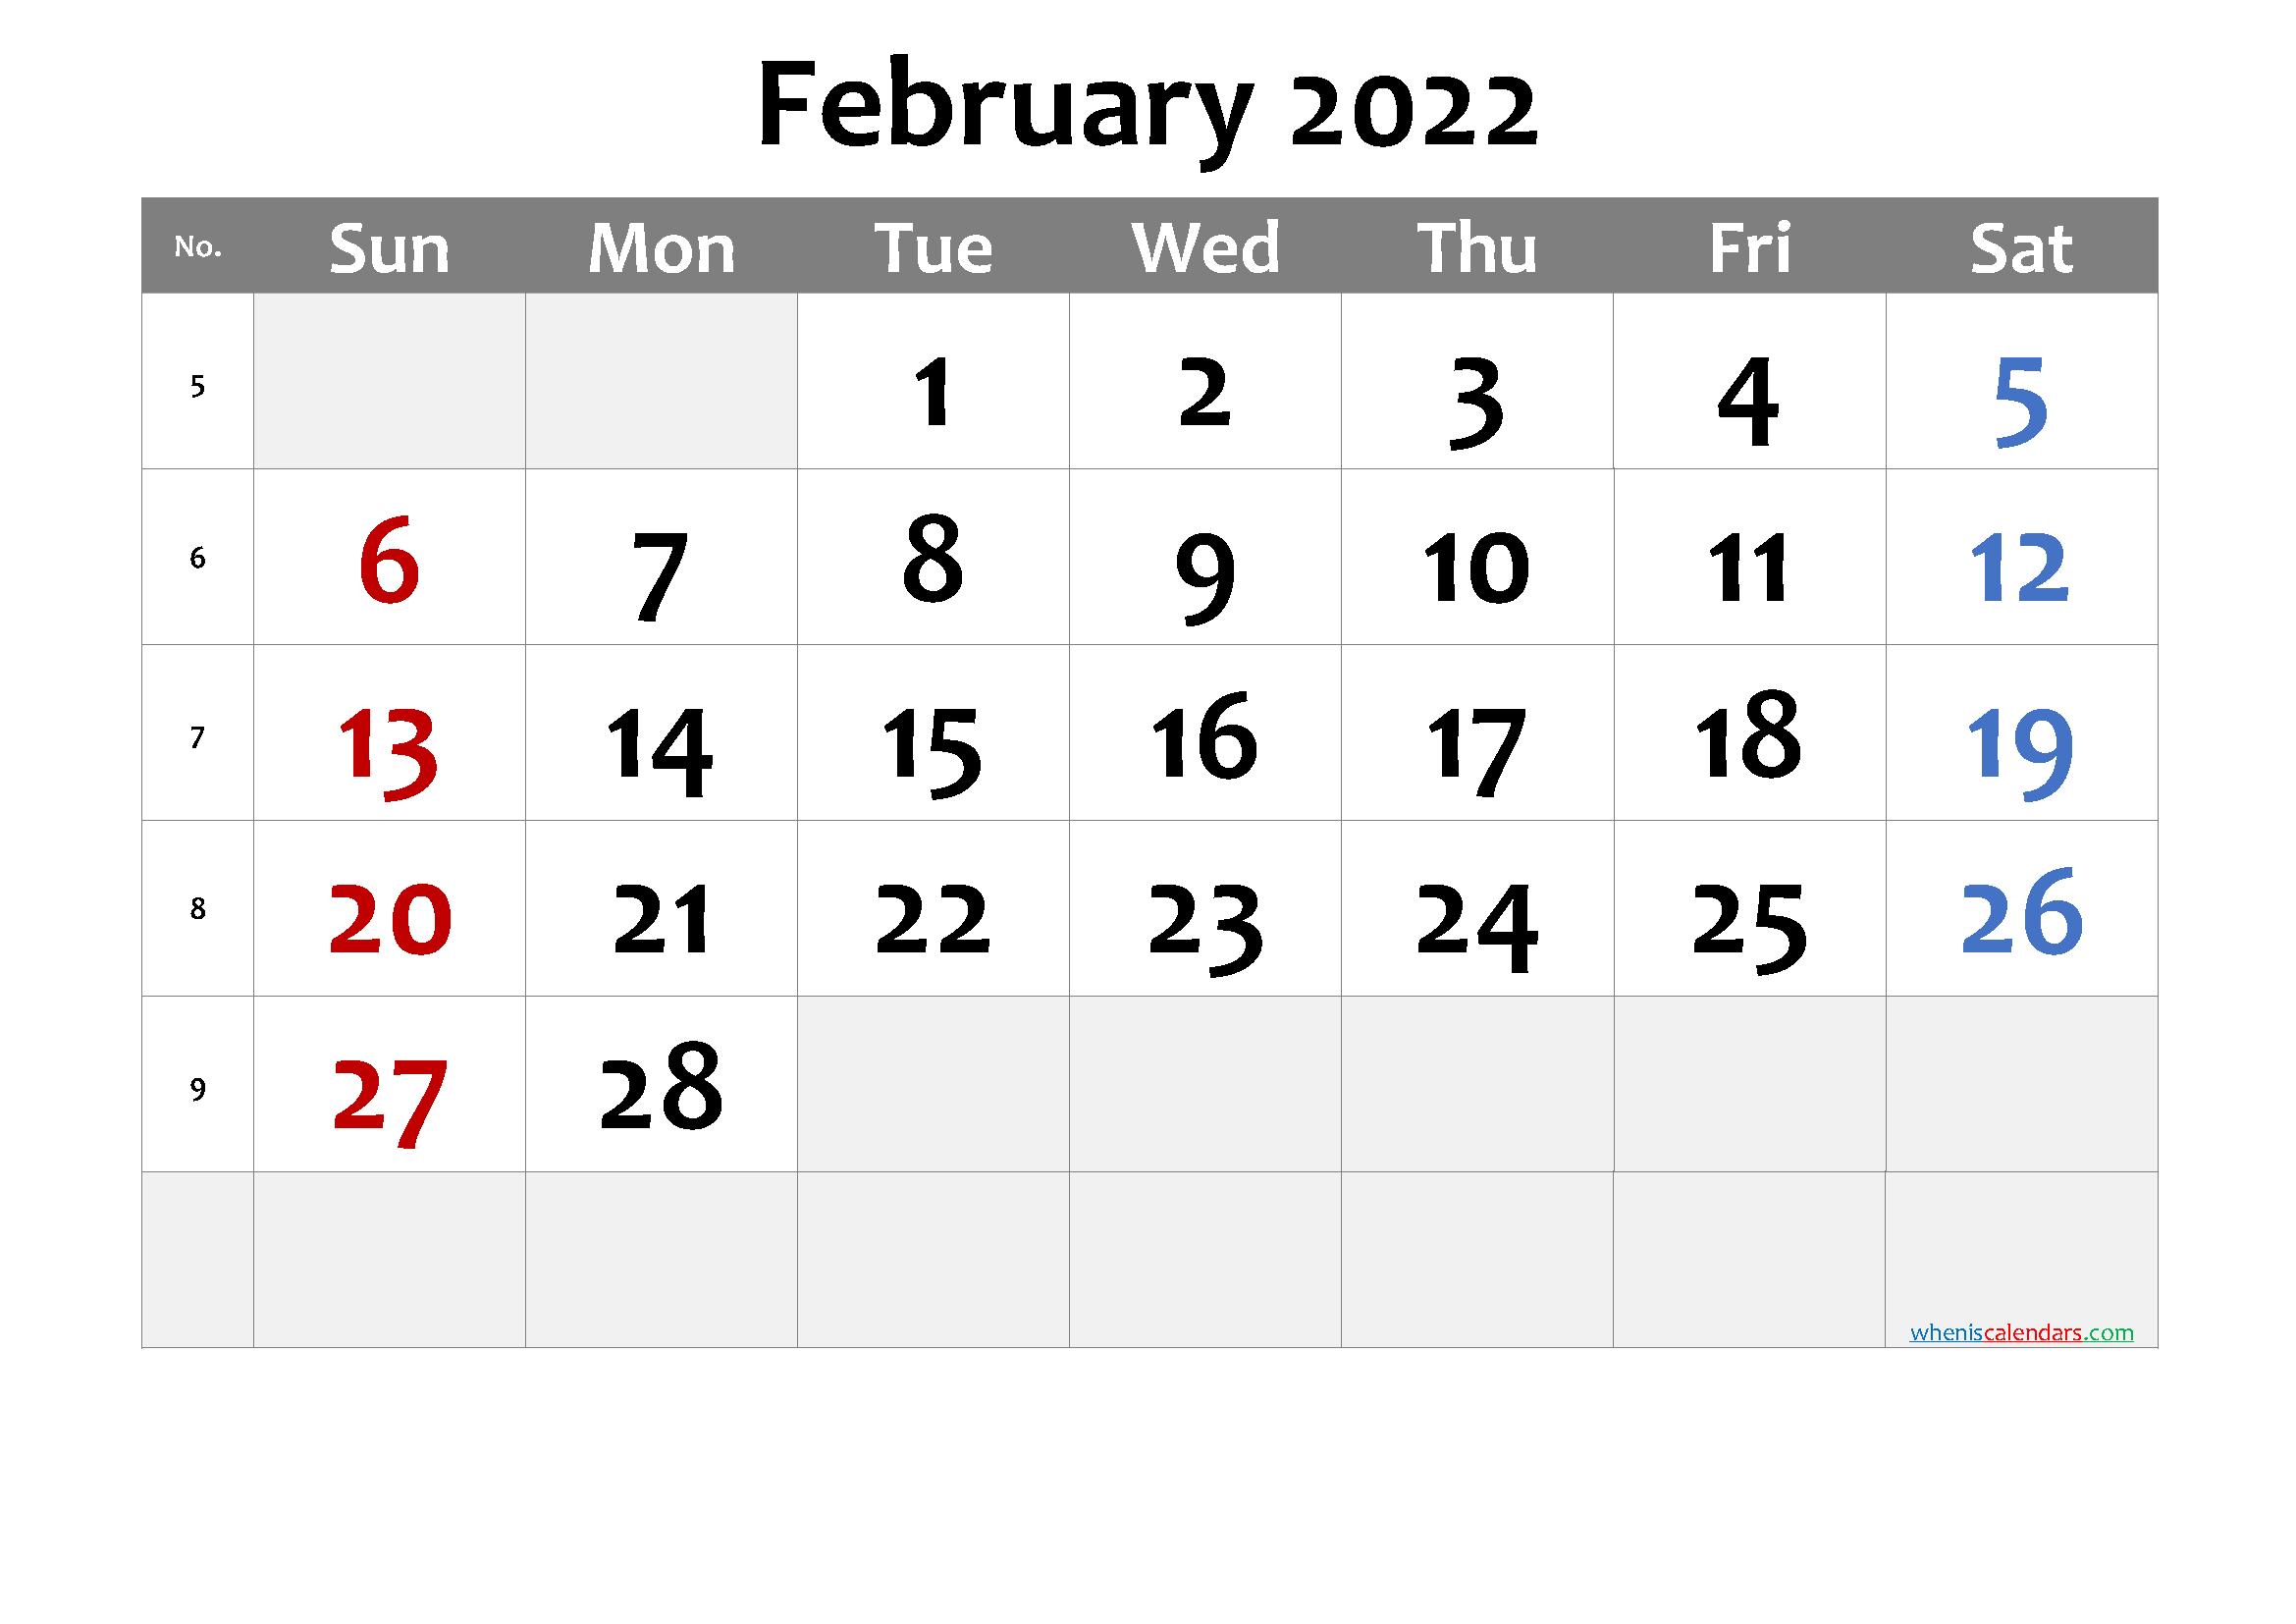 February 2022 Printable Calendar